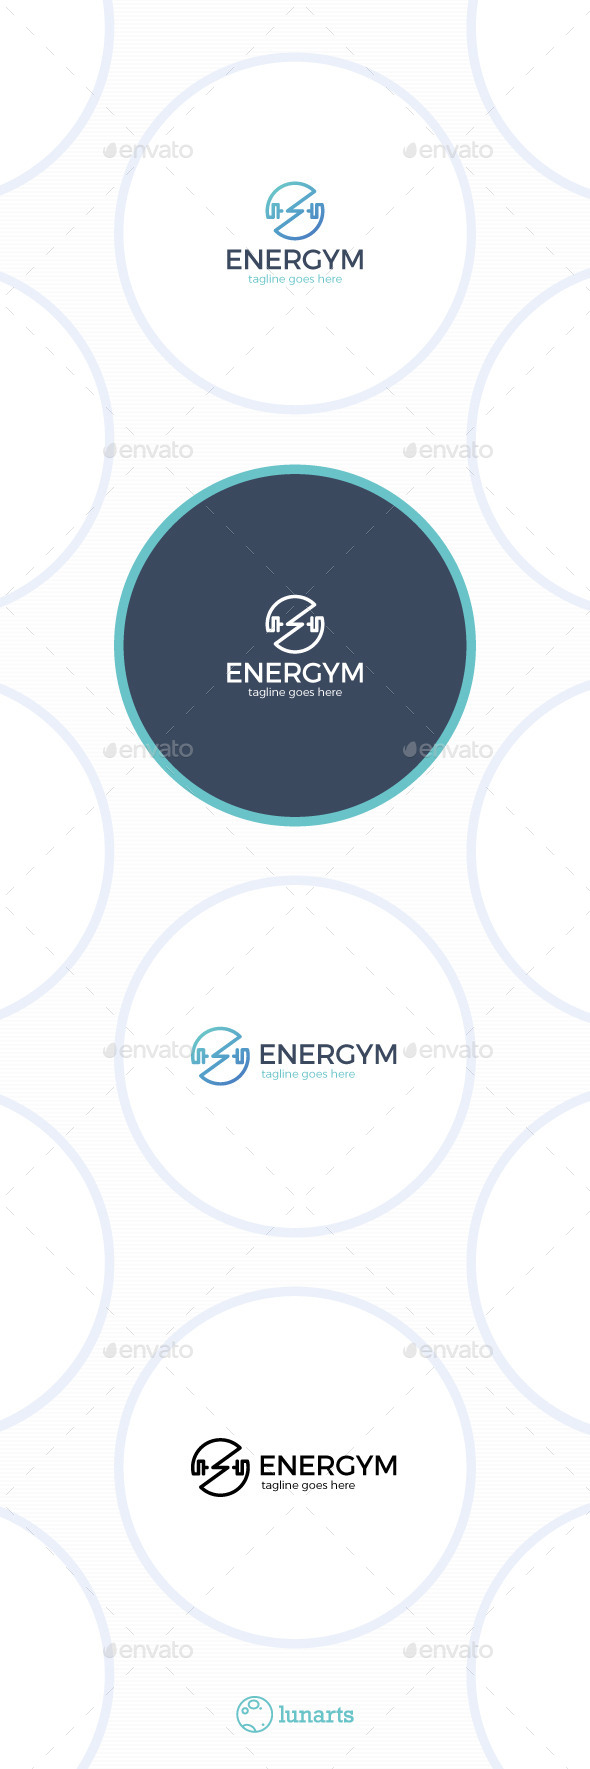 Energy Gym Logo - Power Circle - Symbols Logo Templates